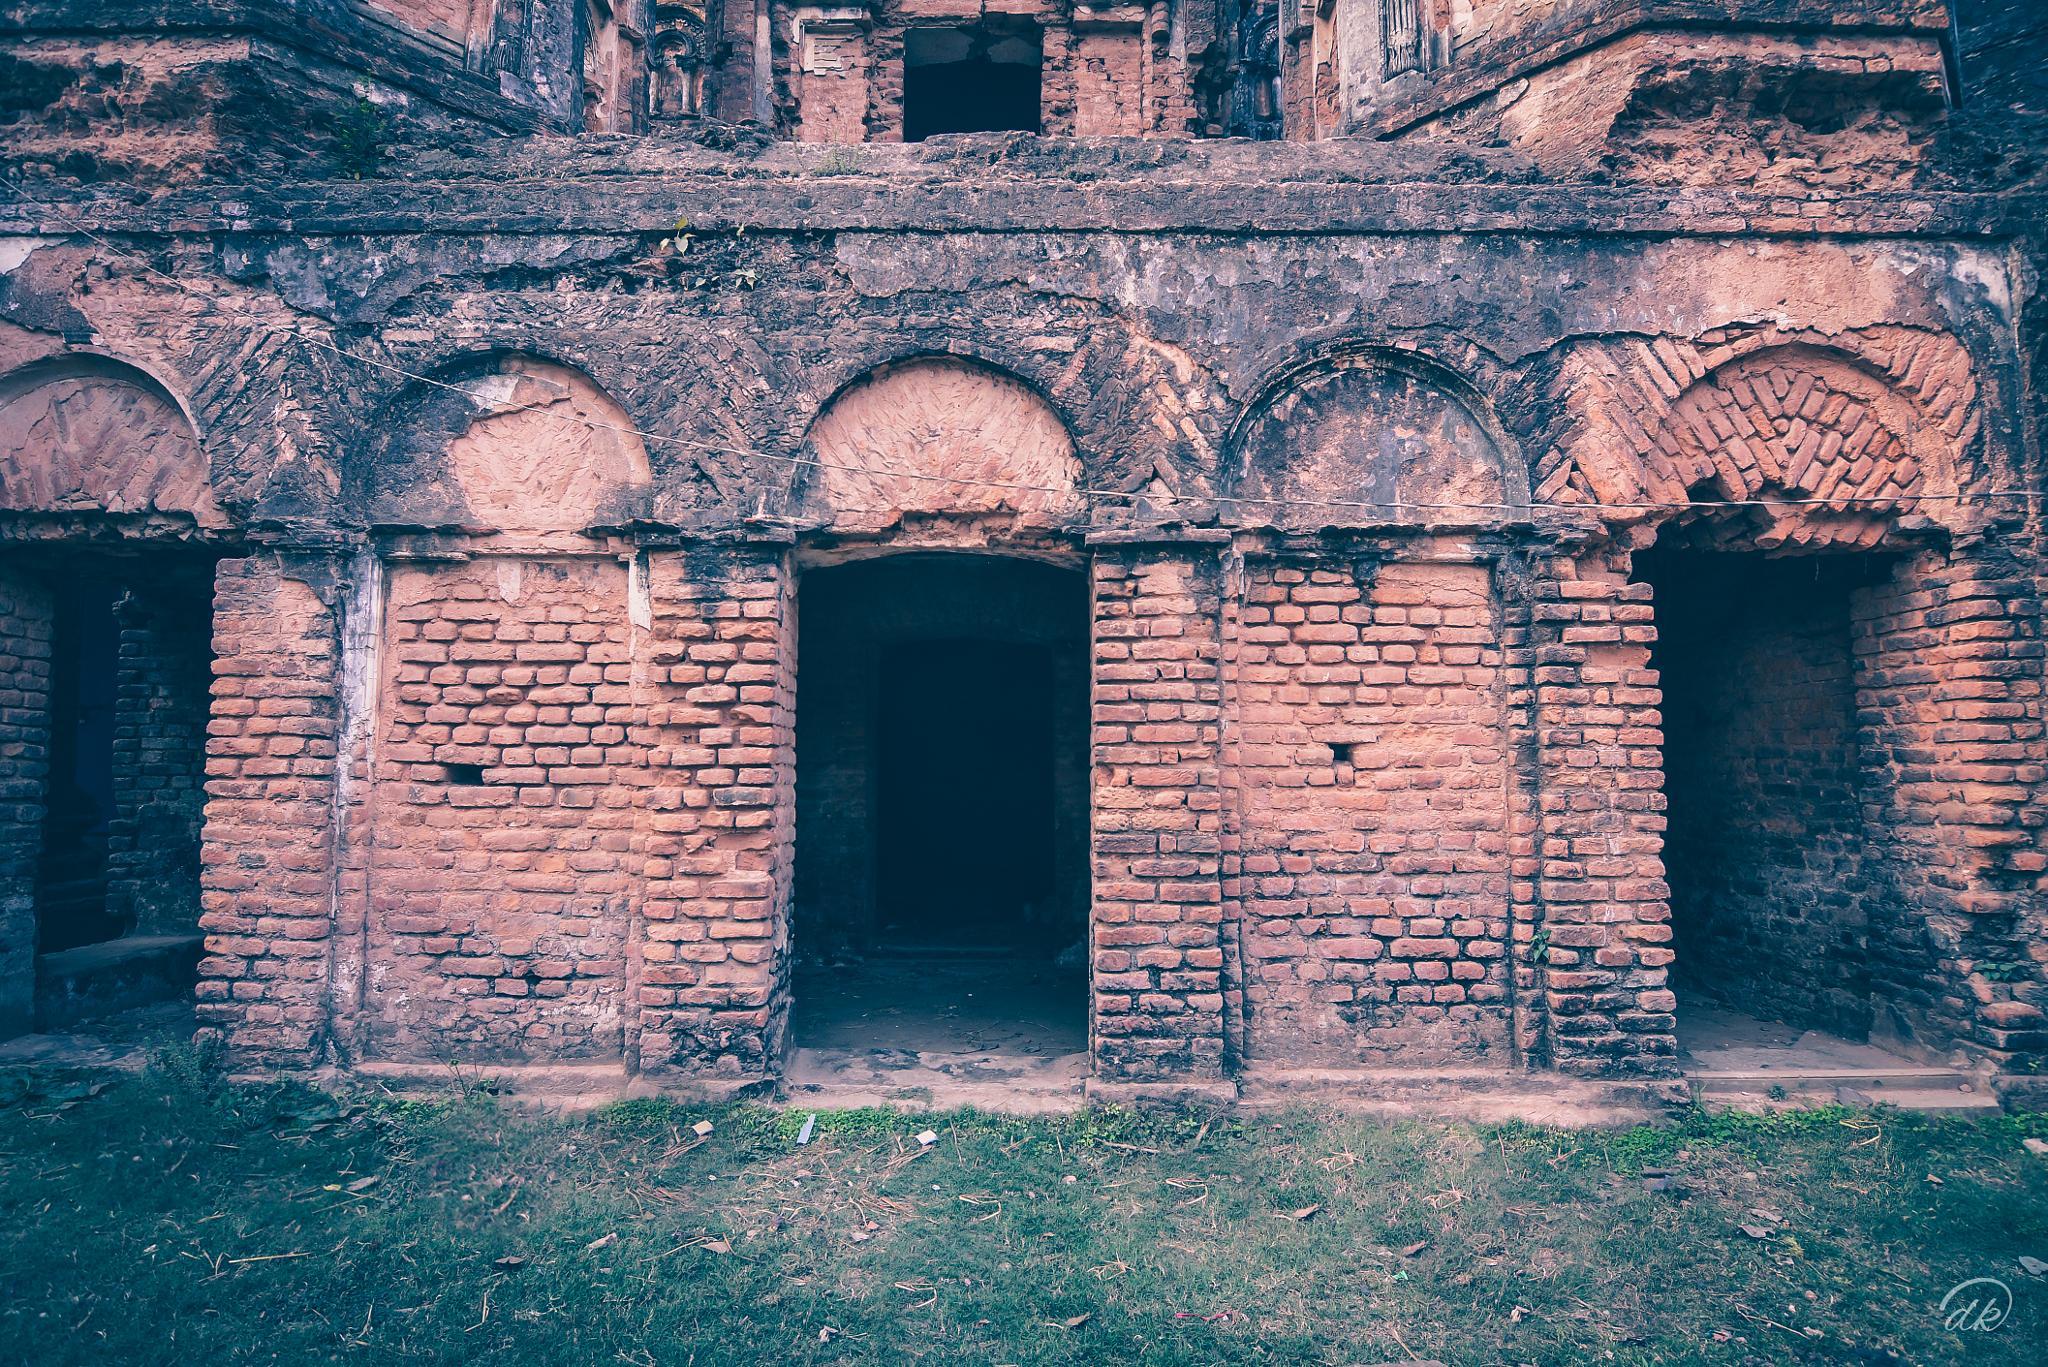 Joydebpur Crematorium Heritage  by dk snap